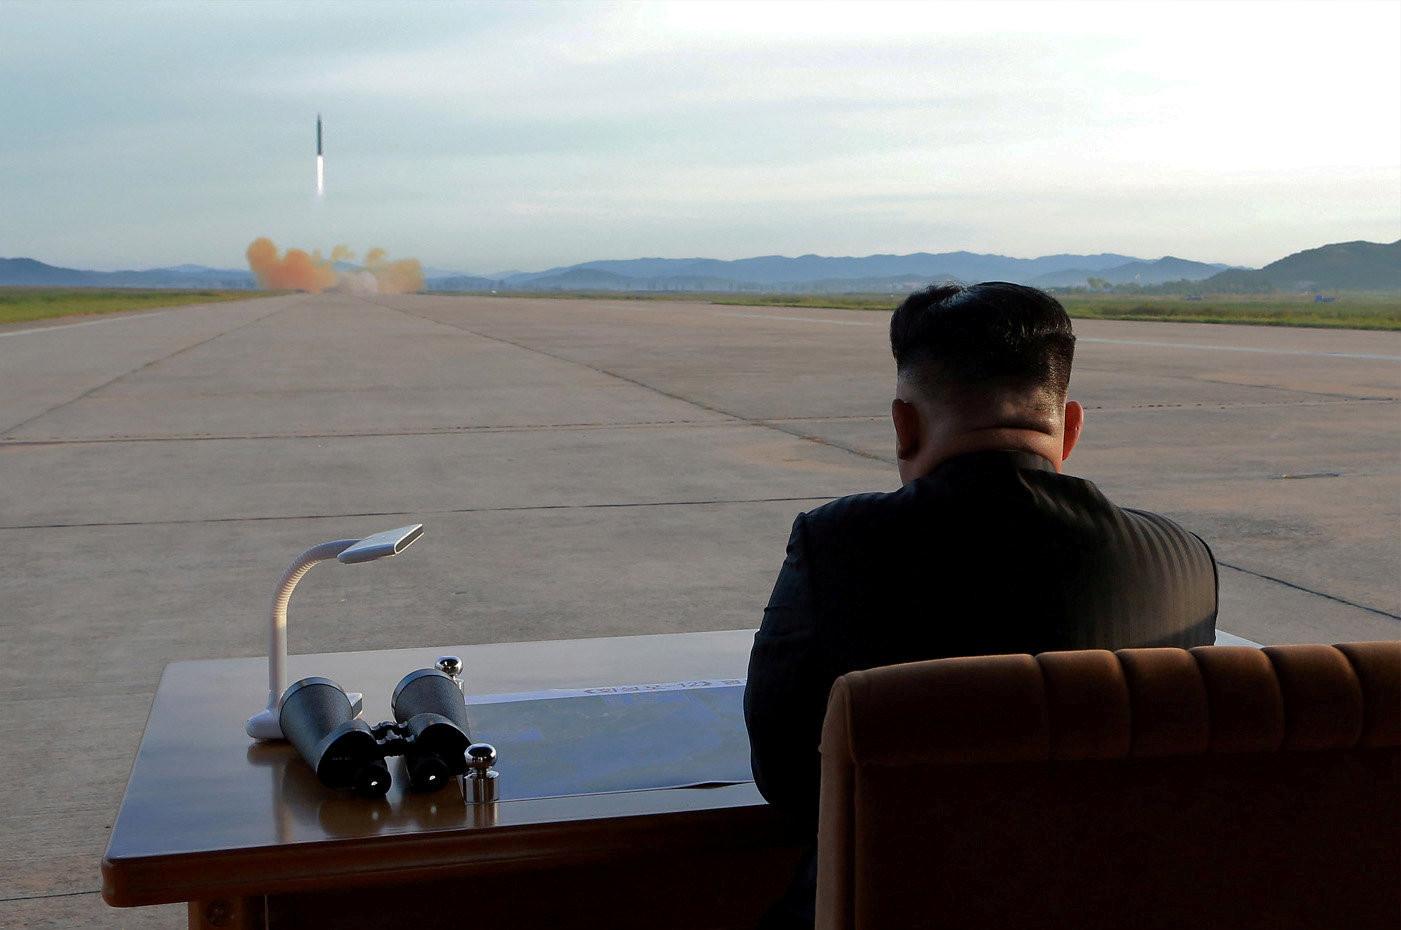 <p><span>Лидер Северной Кореи Ким Чен. Фото: &copy; REUTERS</span></p>